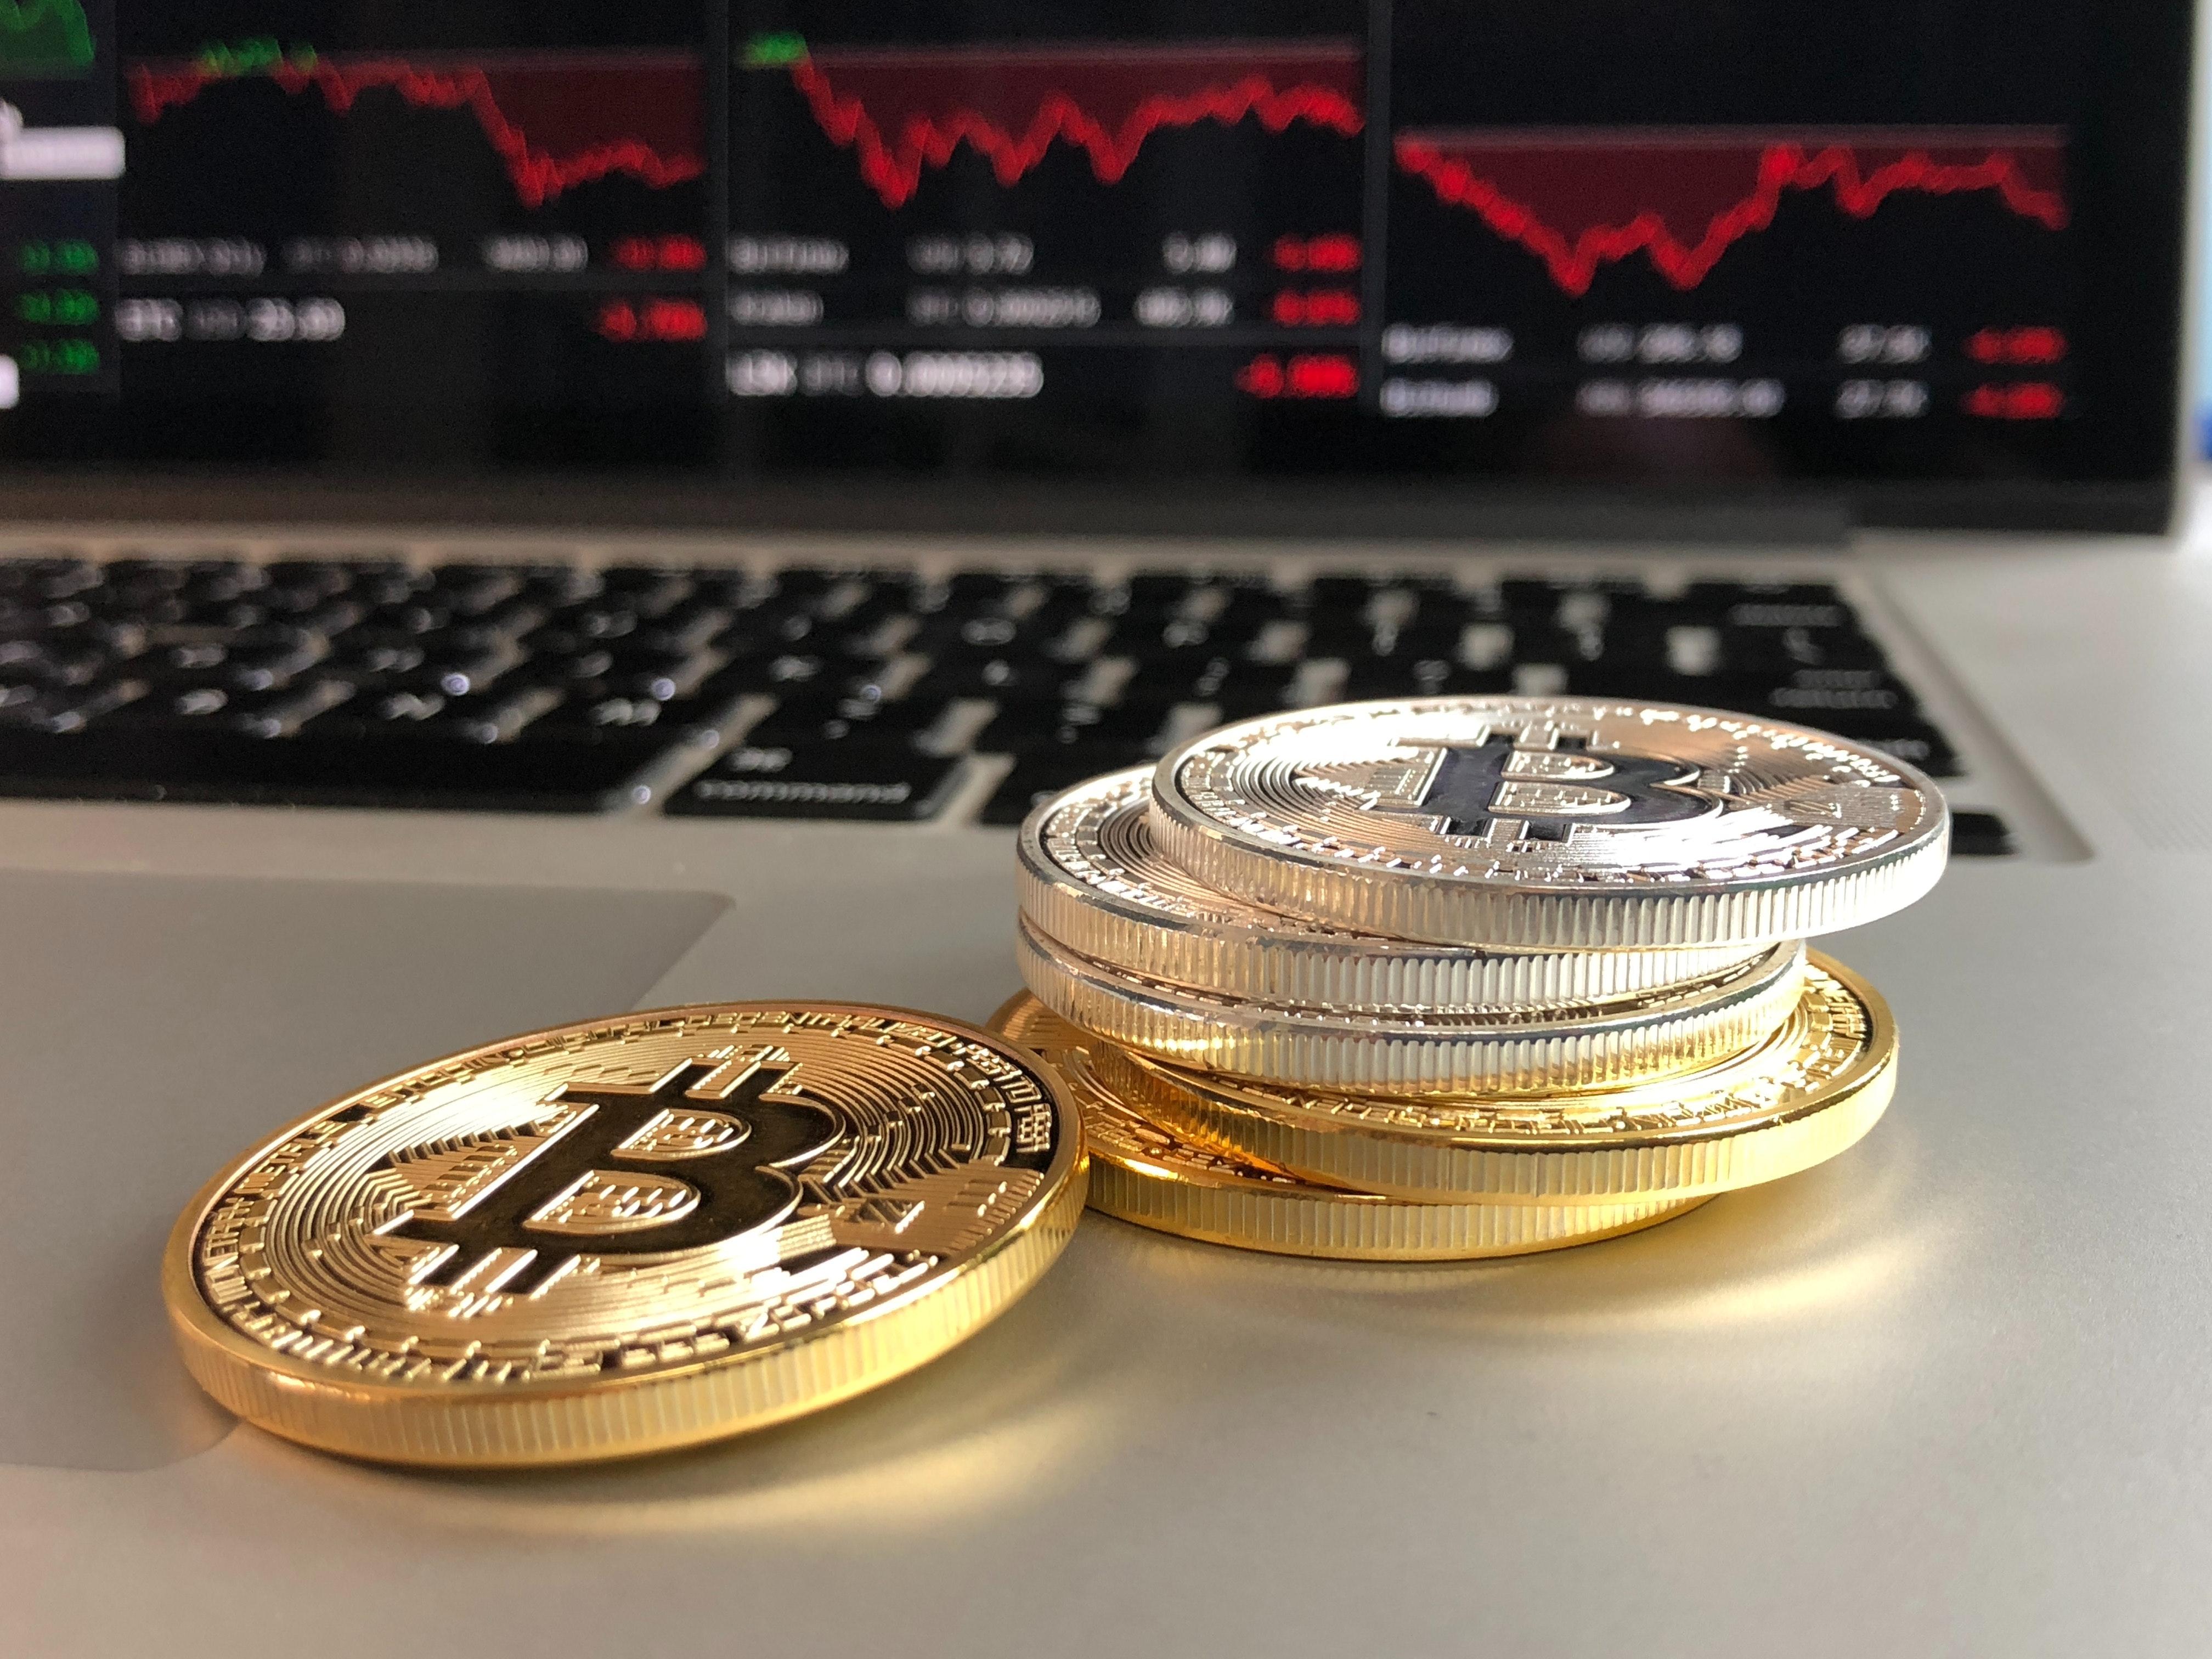 Easiest Way To Buy Bitcoin In Australia